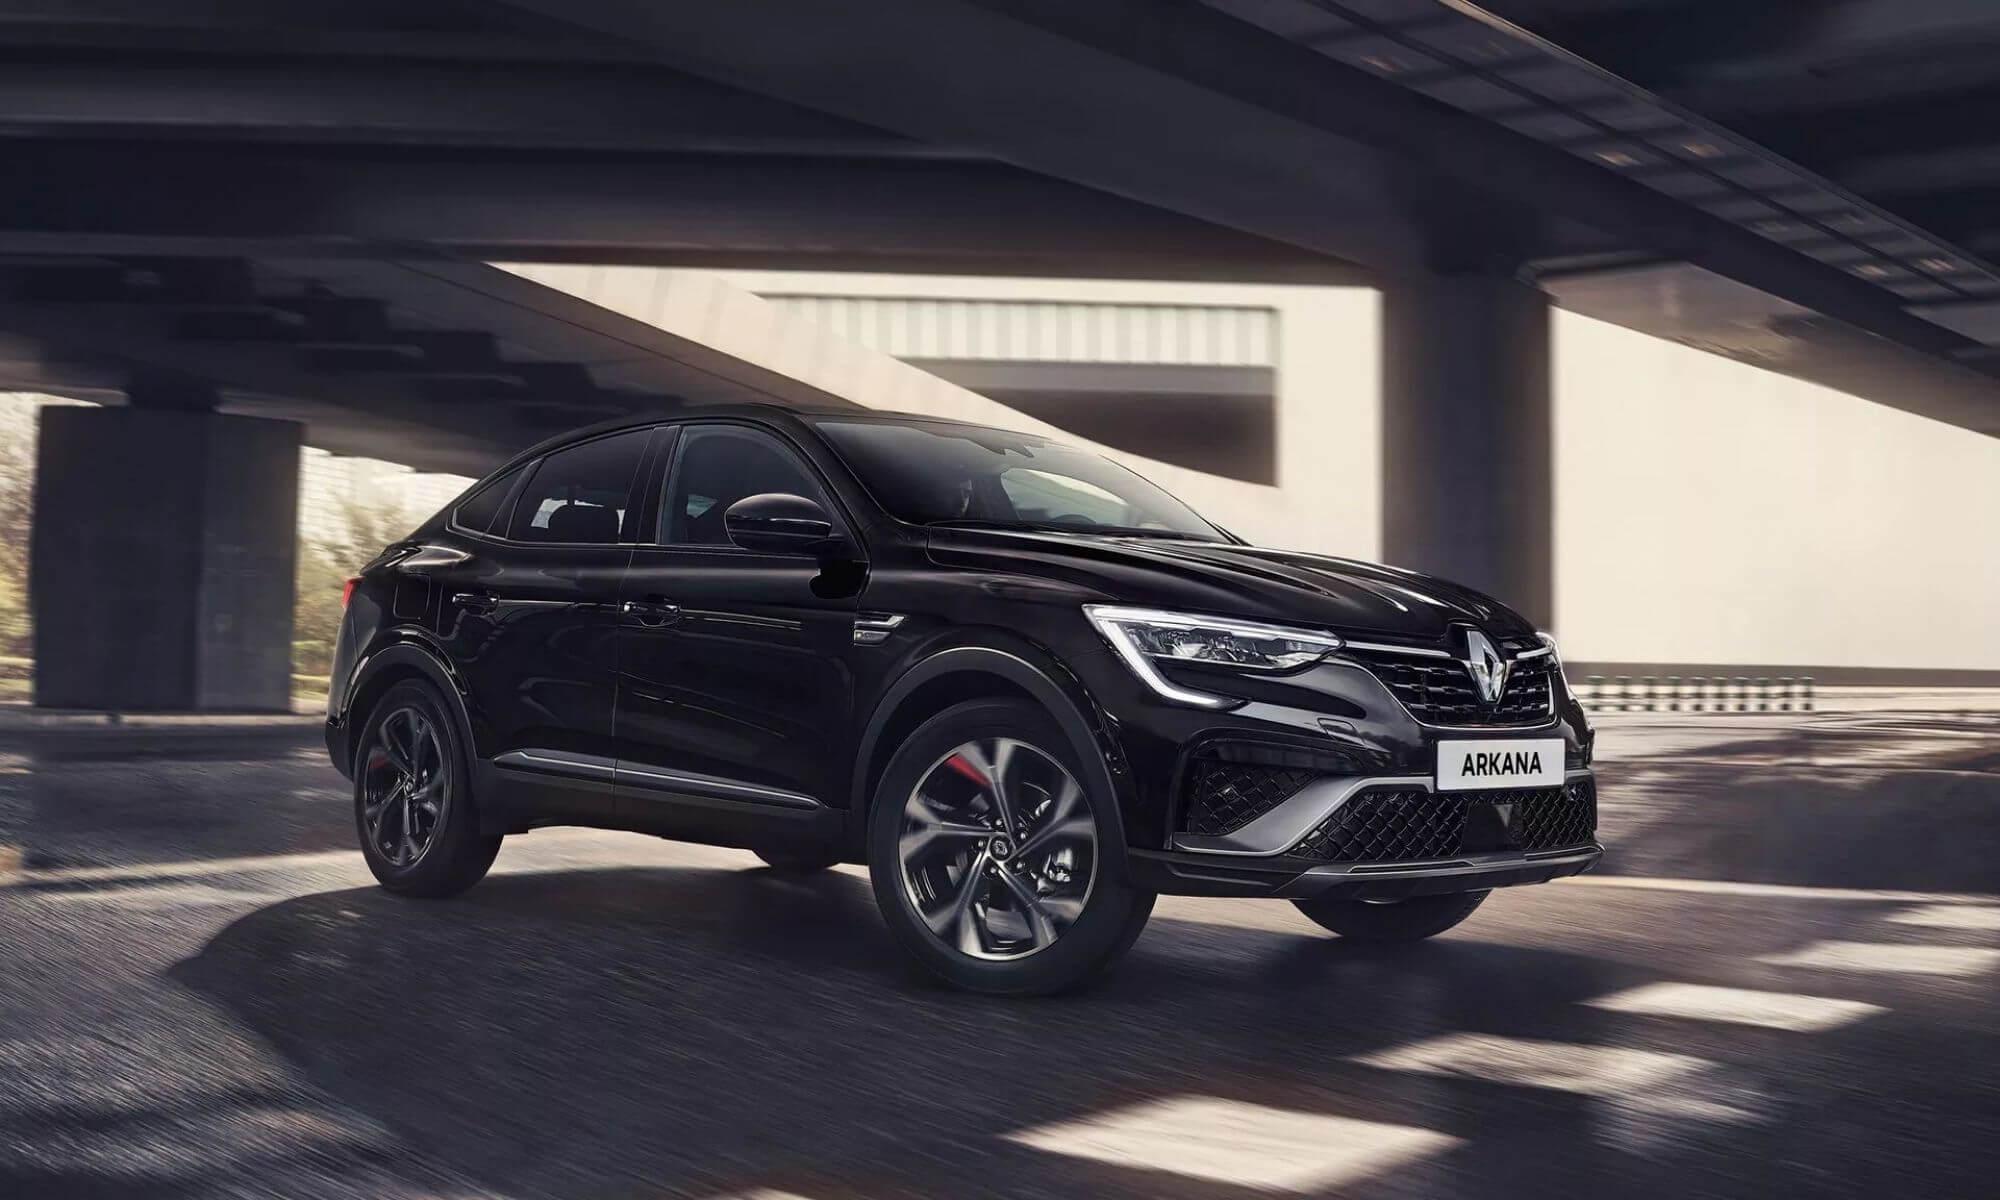 Renault Arkana Exterior